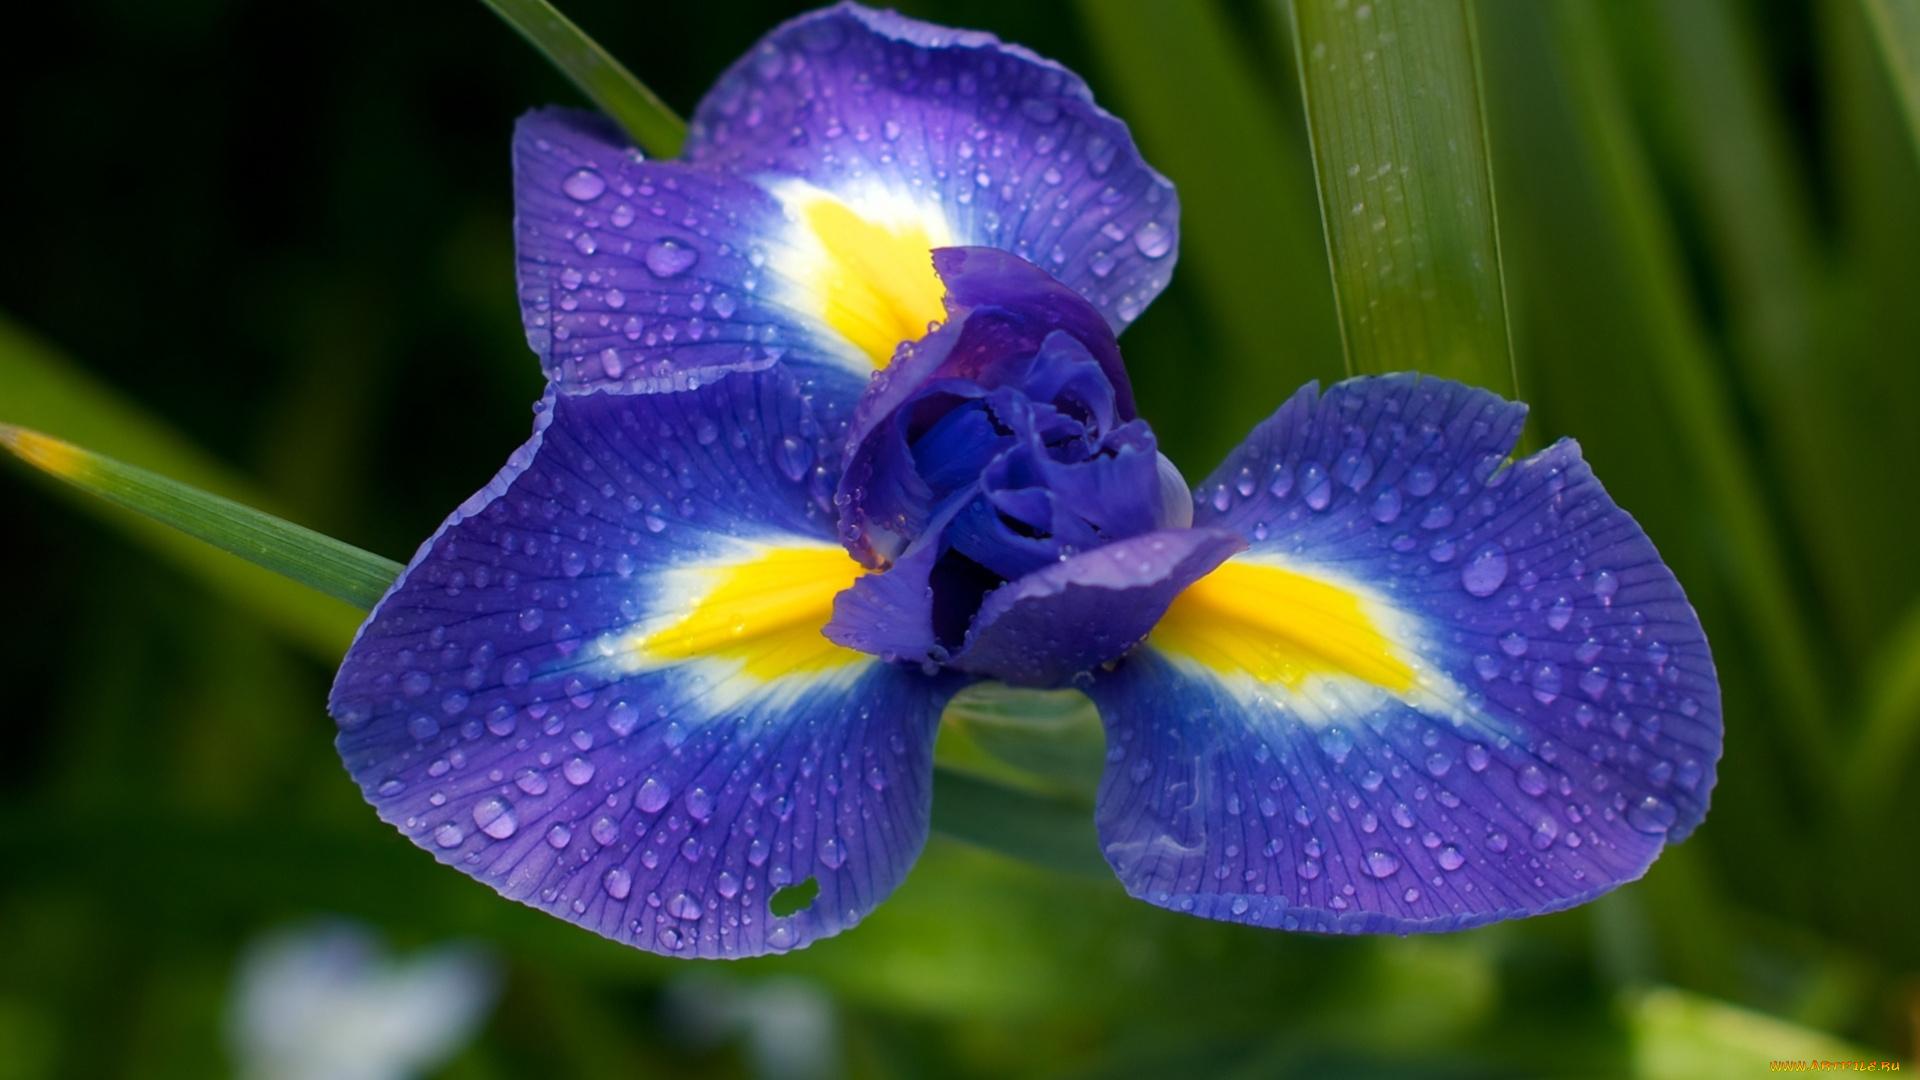 дождь, капля, цветок, ирис, лето без смс